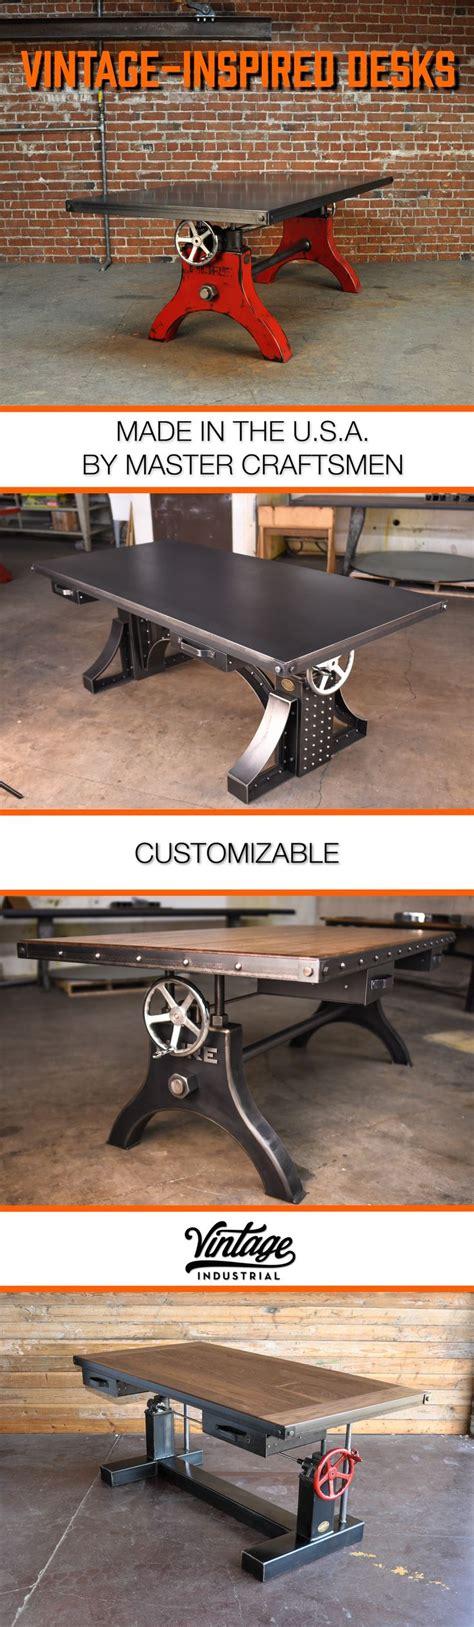 werkstatt 4 fälle handmade to order vintage inspired desks let us what